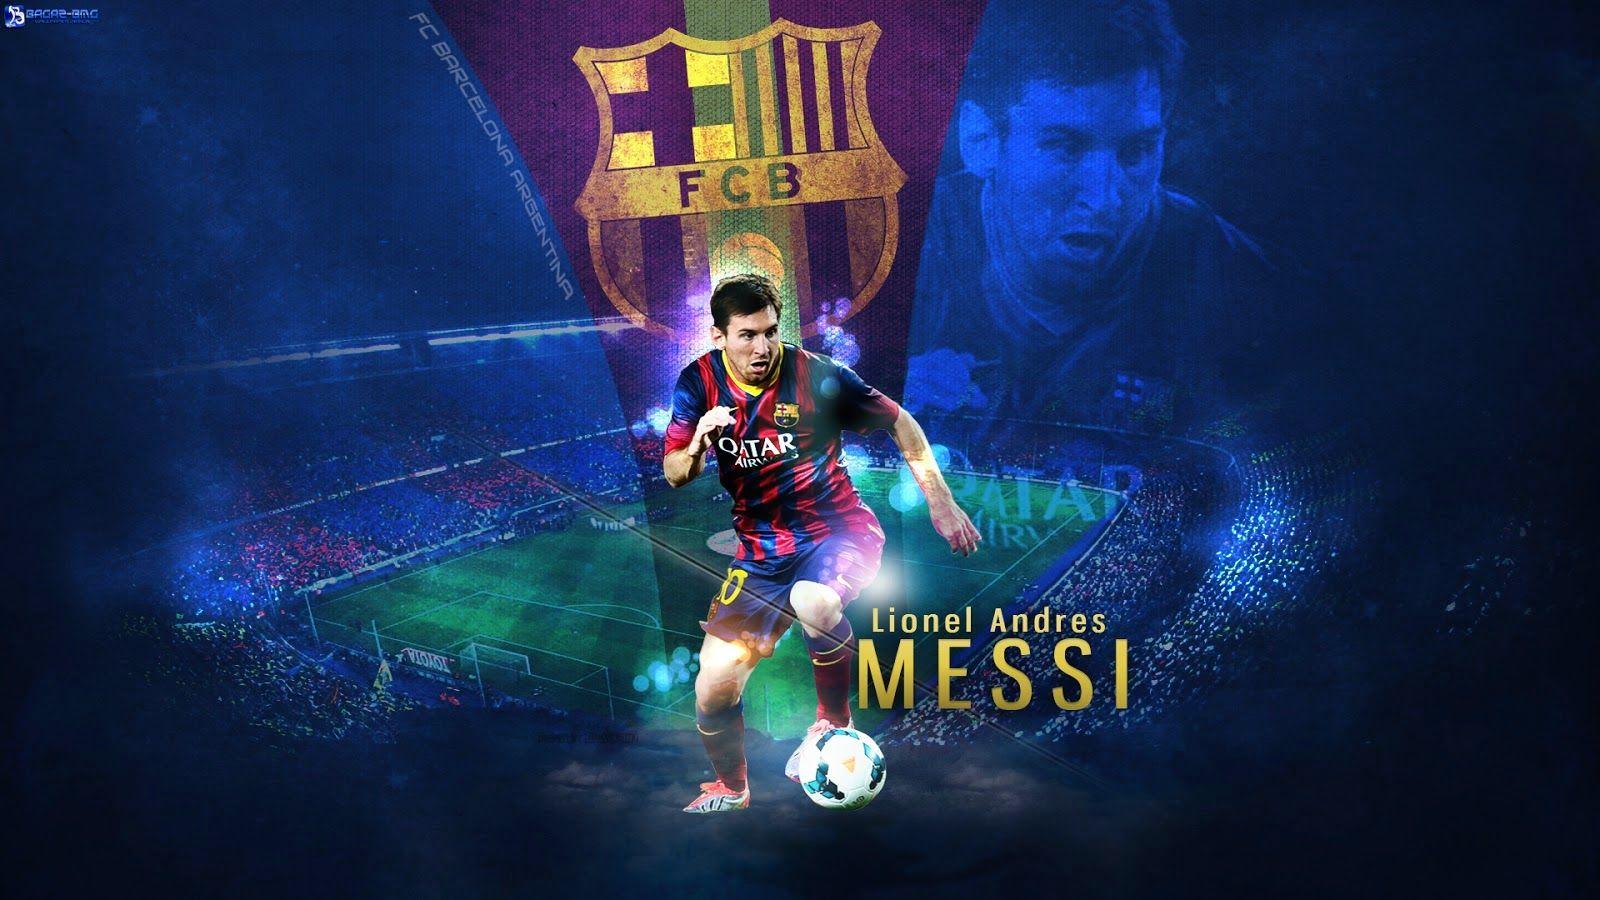 wallpaper free picture: Lionel Messi Wallpaper 2011 #1